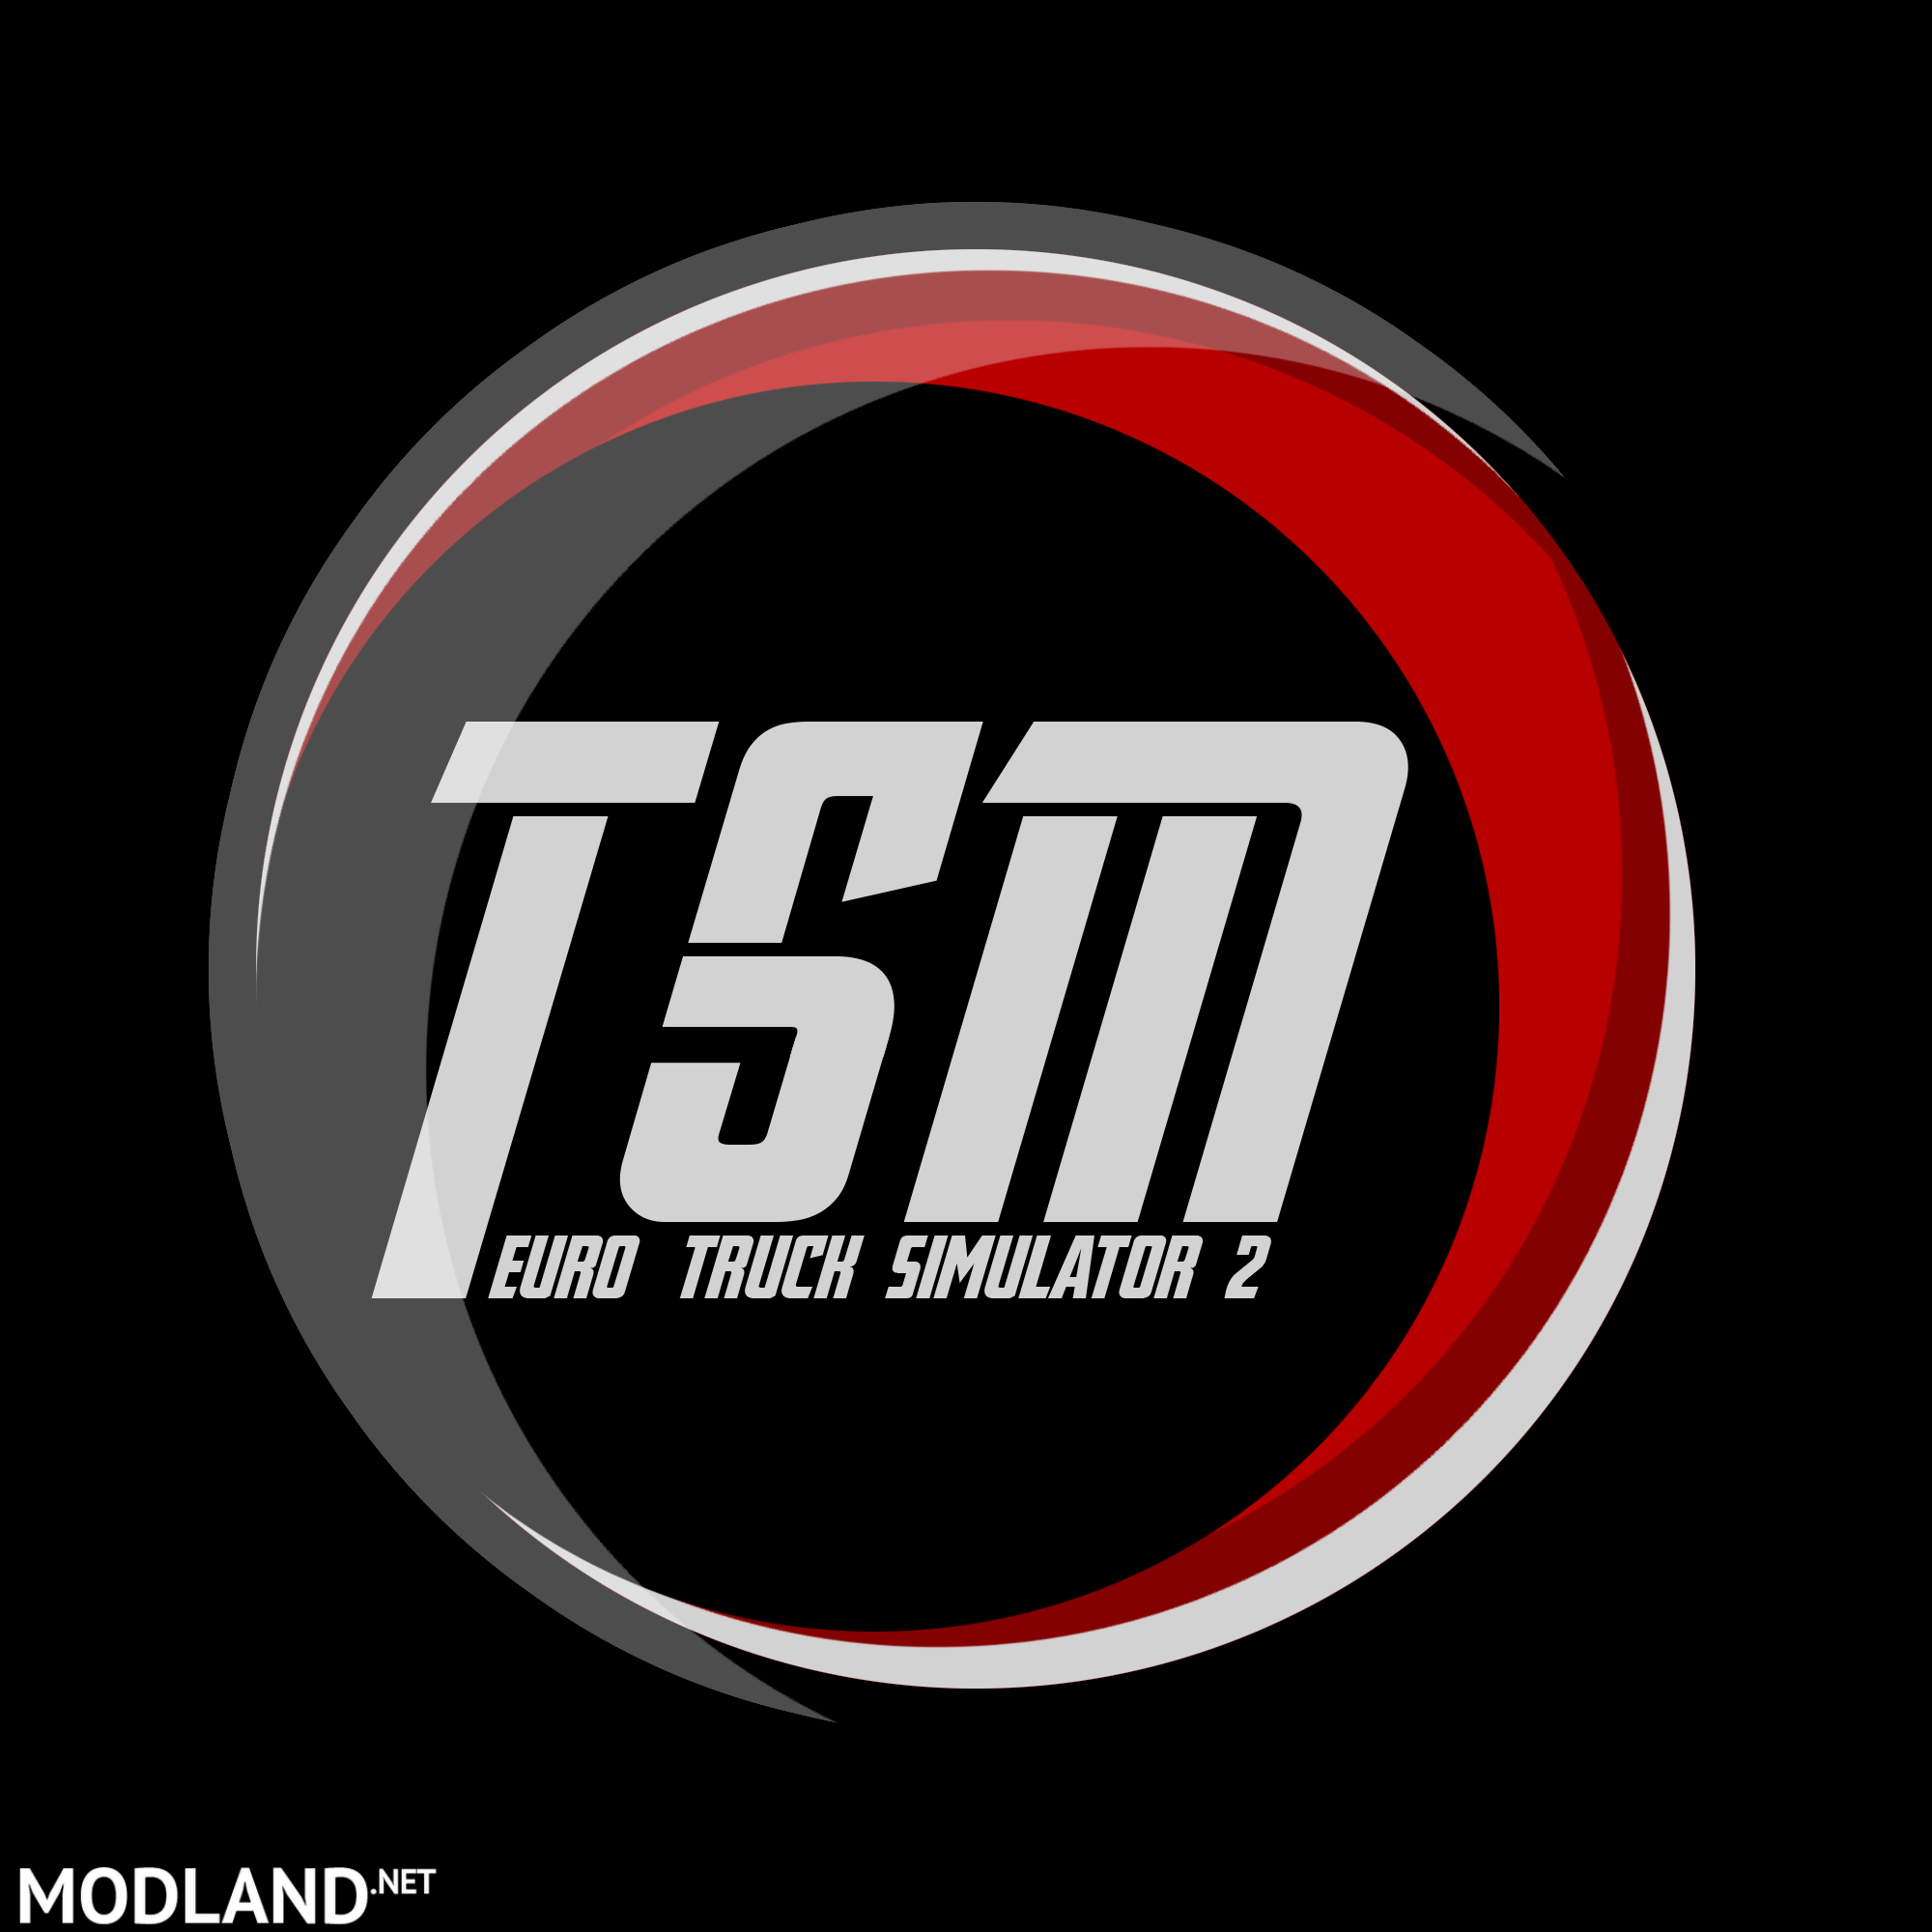 Justplaymod F 252 R Tsm 6 5 Mod For Ets 2